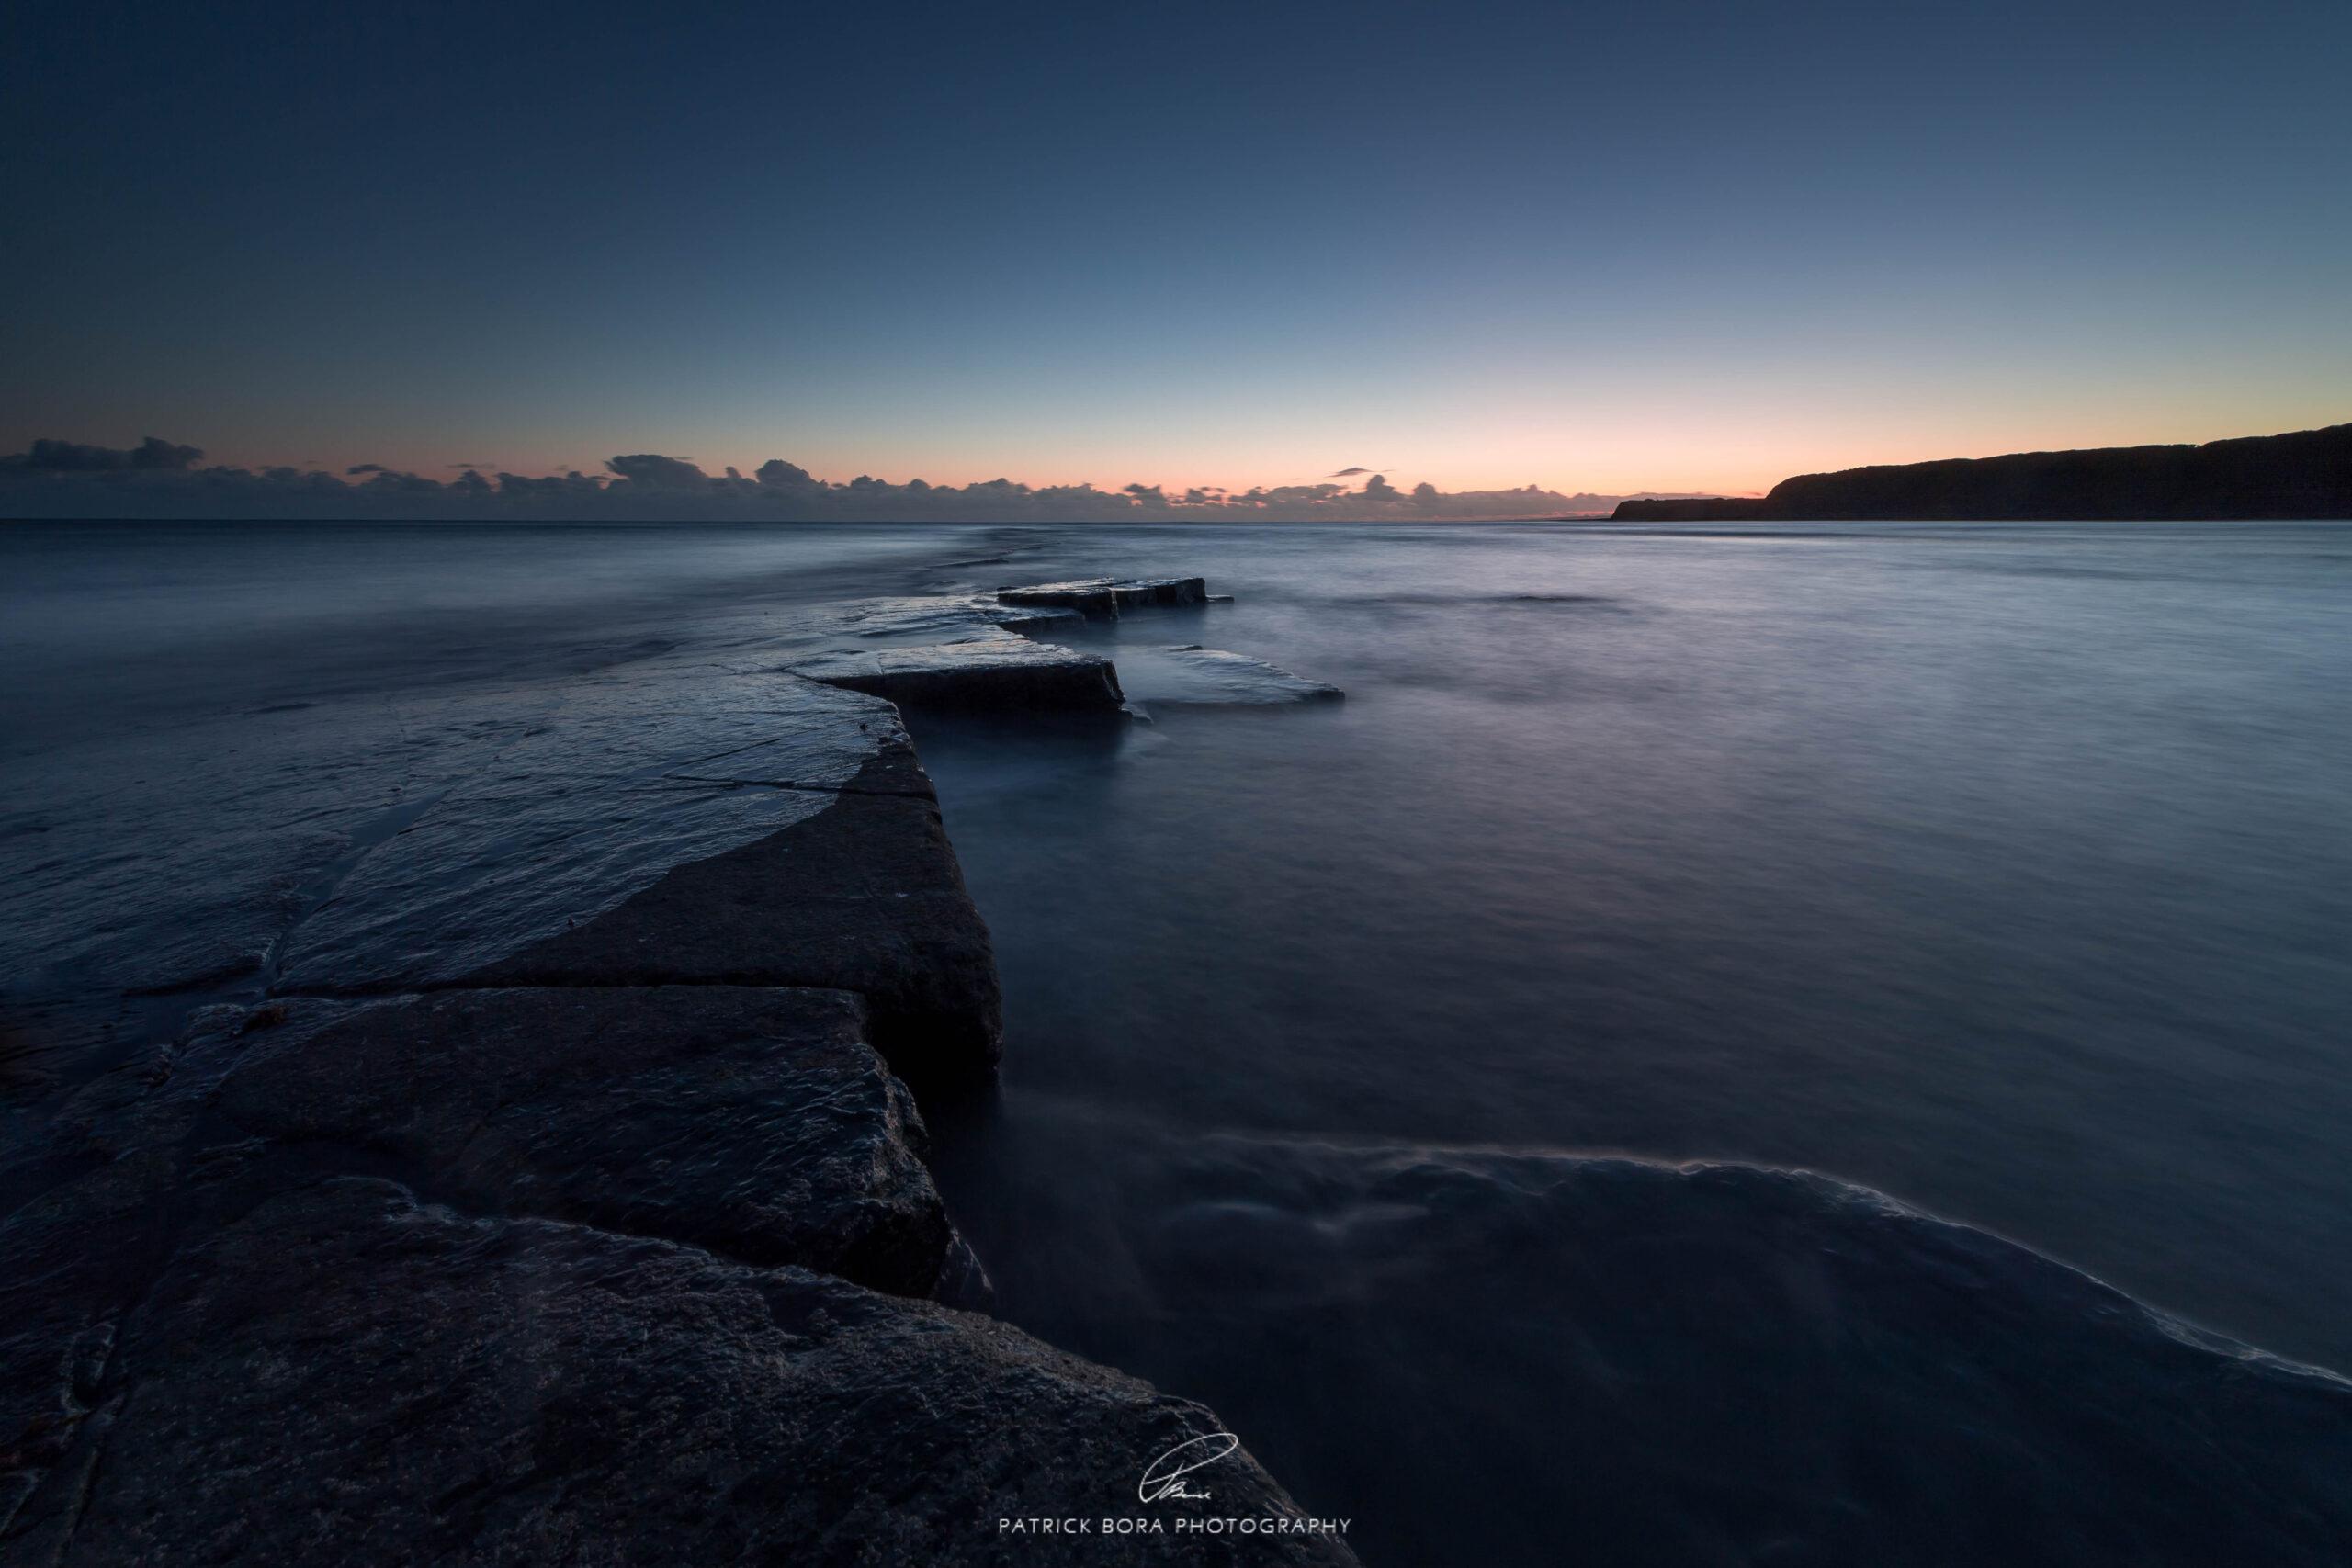 Patrick Bora Photography